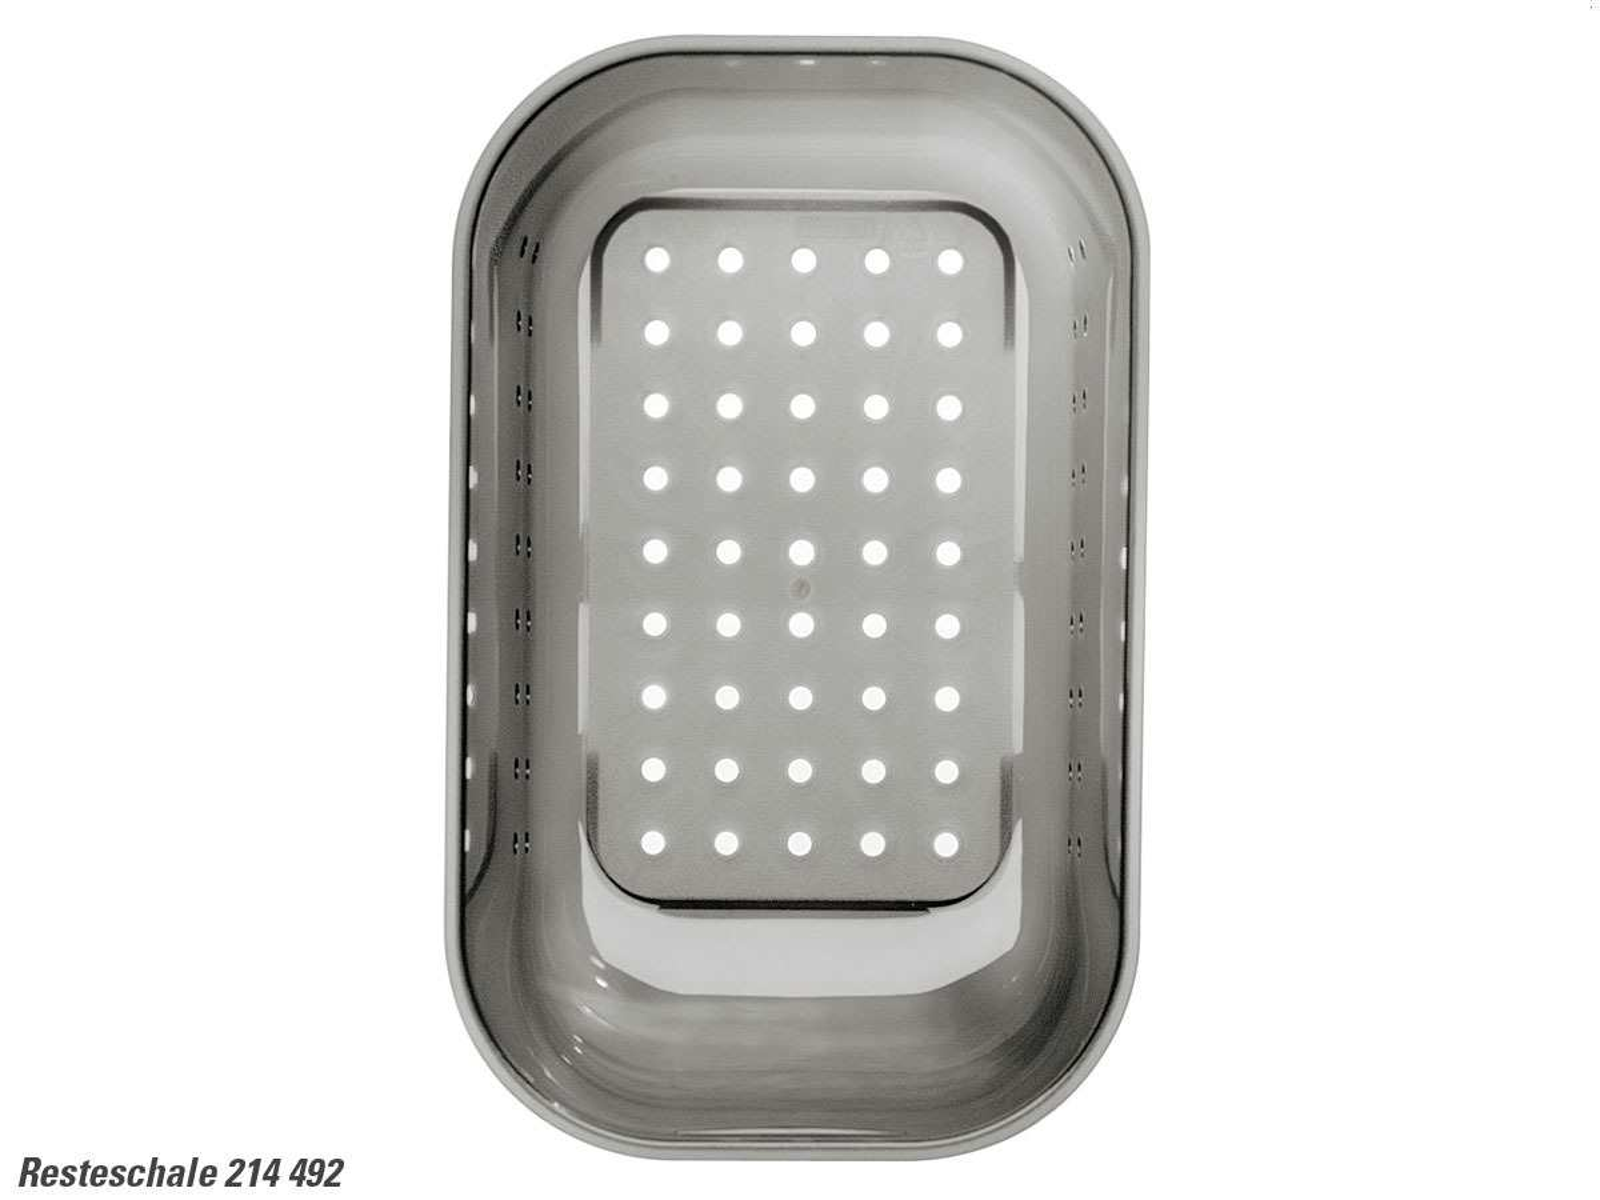 Blanco 214 492 Resteschale Kunststoff grau